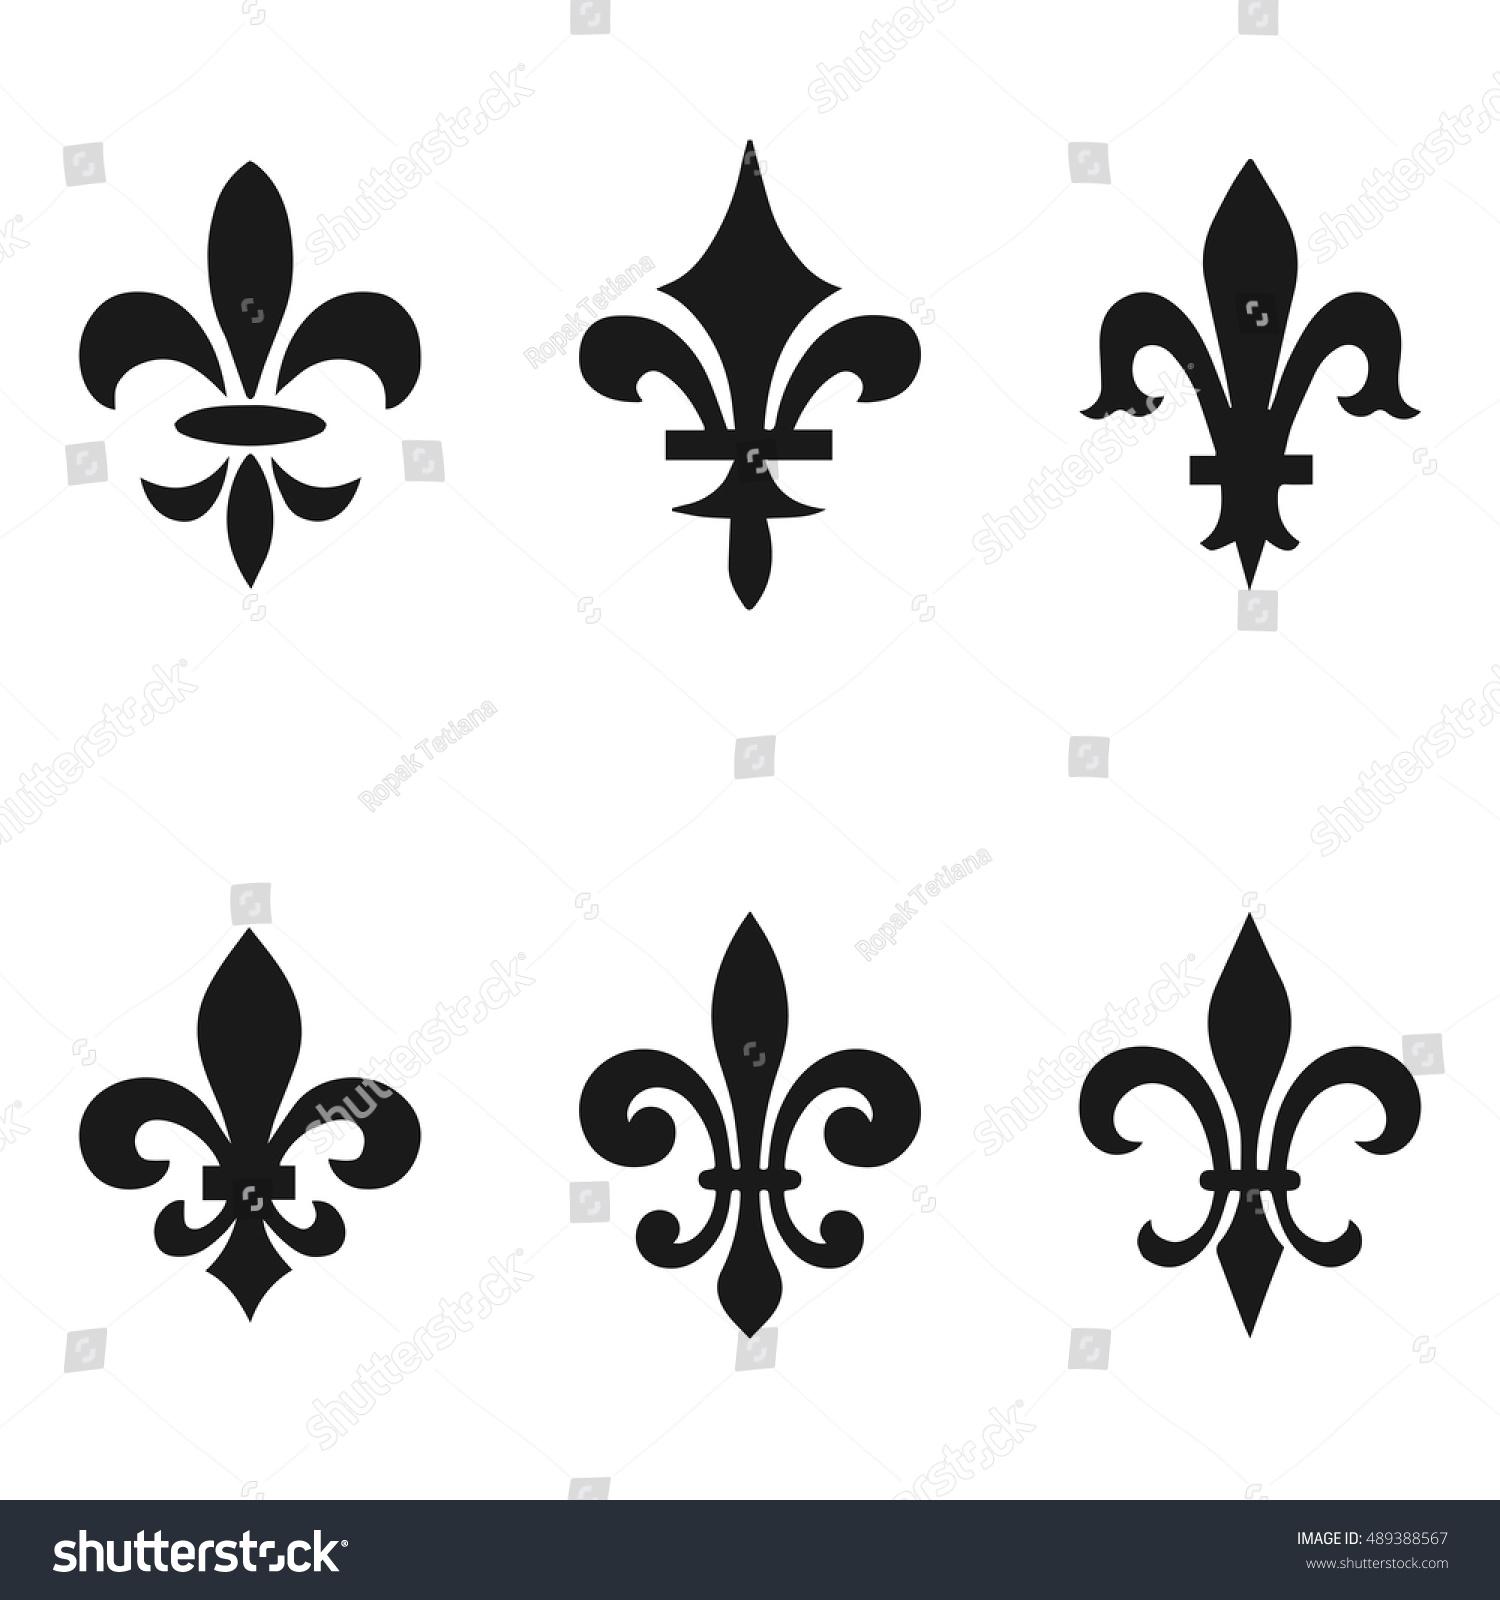 Collection Fleur De Lis Symbols Black Stock Vector Royalty Free